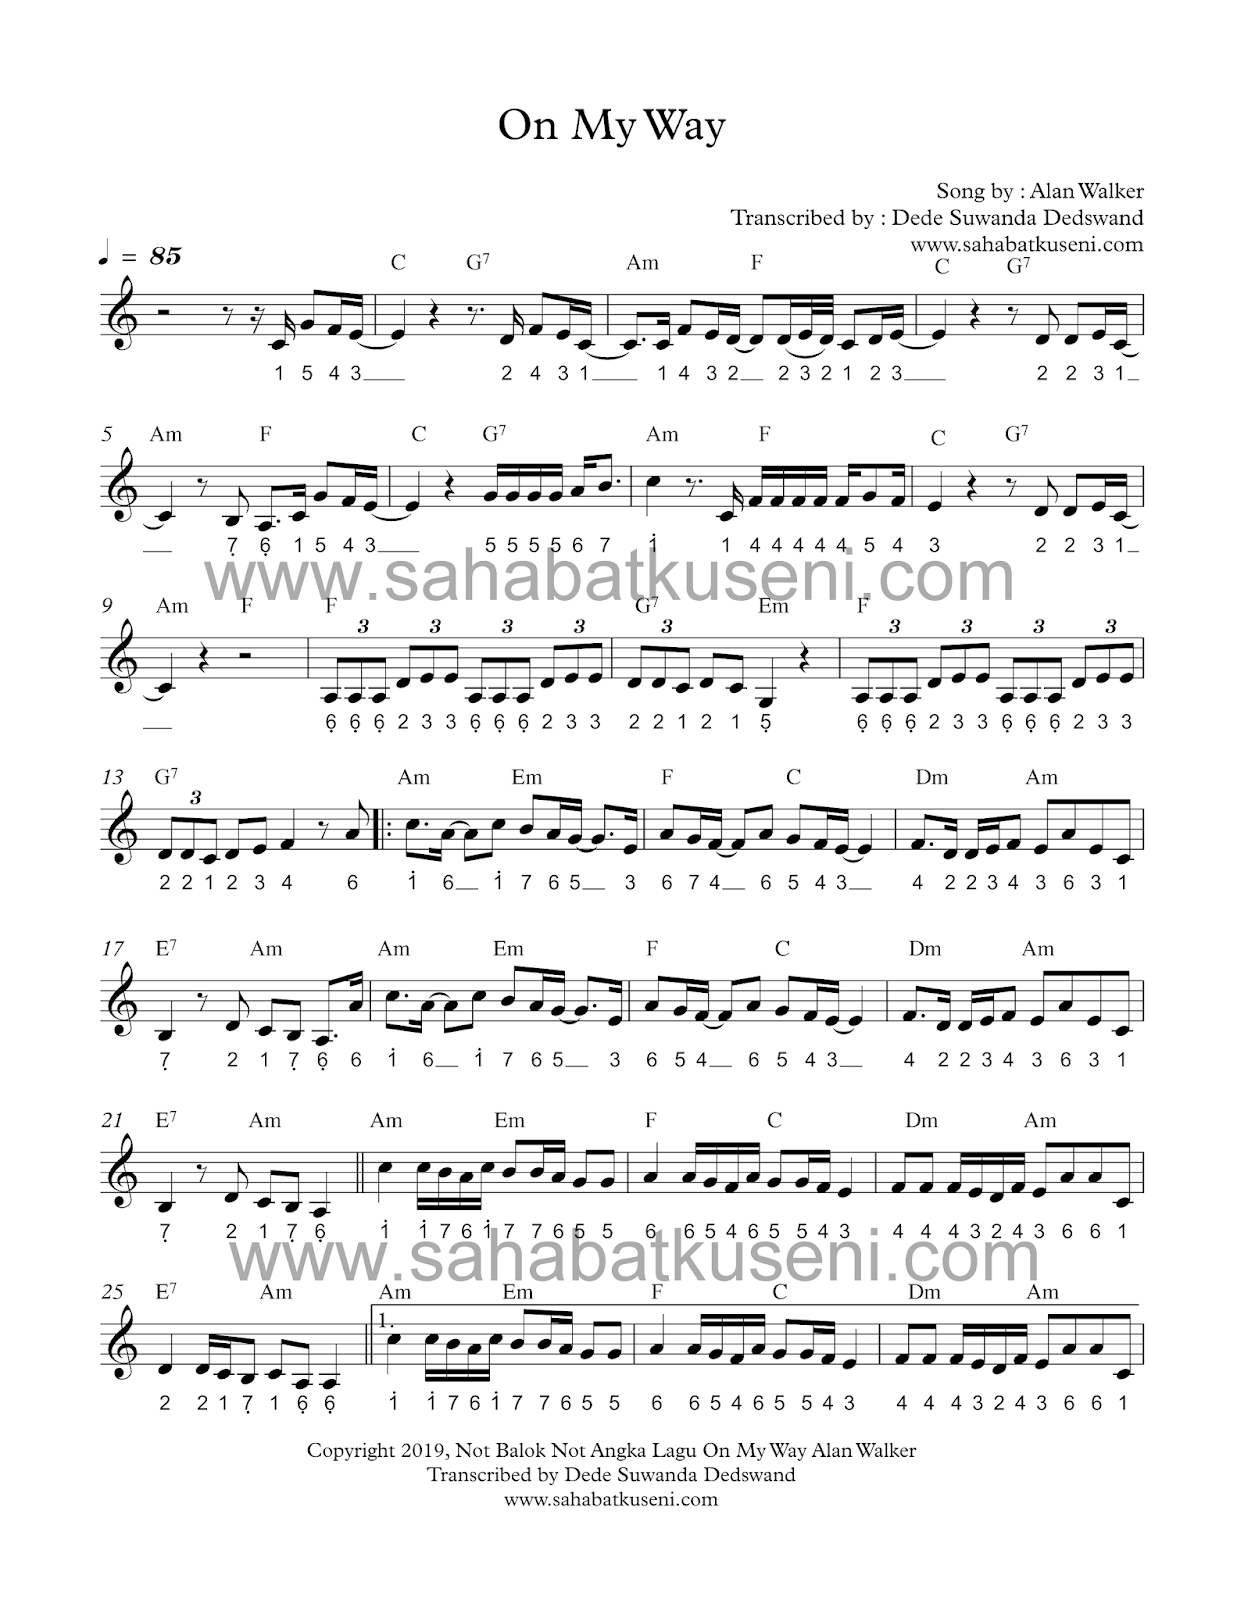 Not Pianika Lagu On My Way : pianika, Angka, Walker, Berikut, Balok, Chordnya, Sahabatku